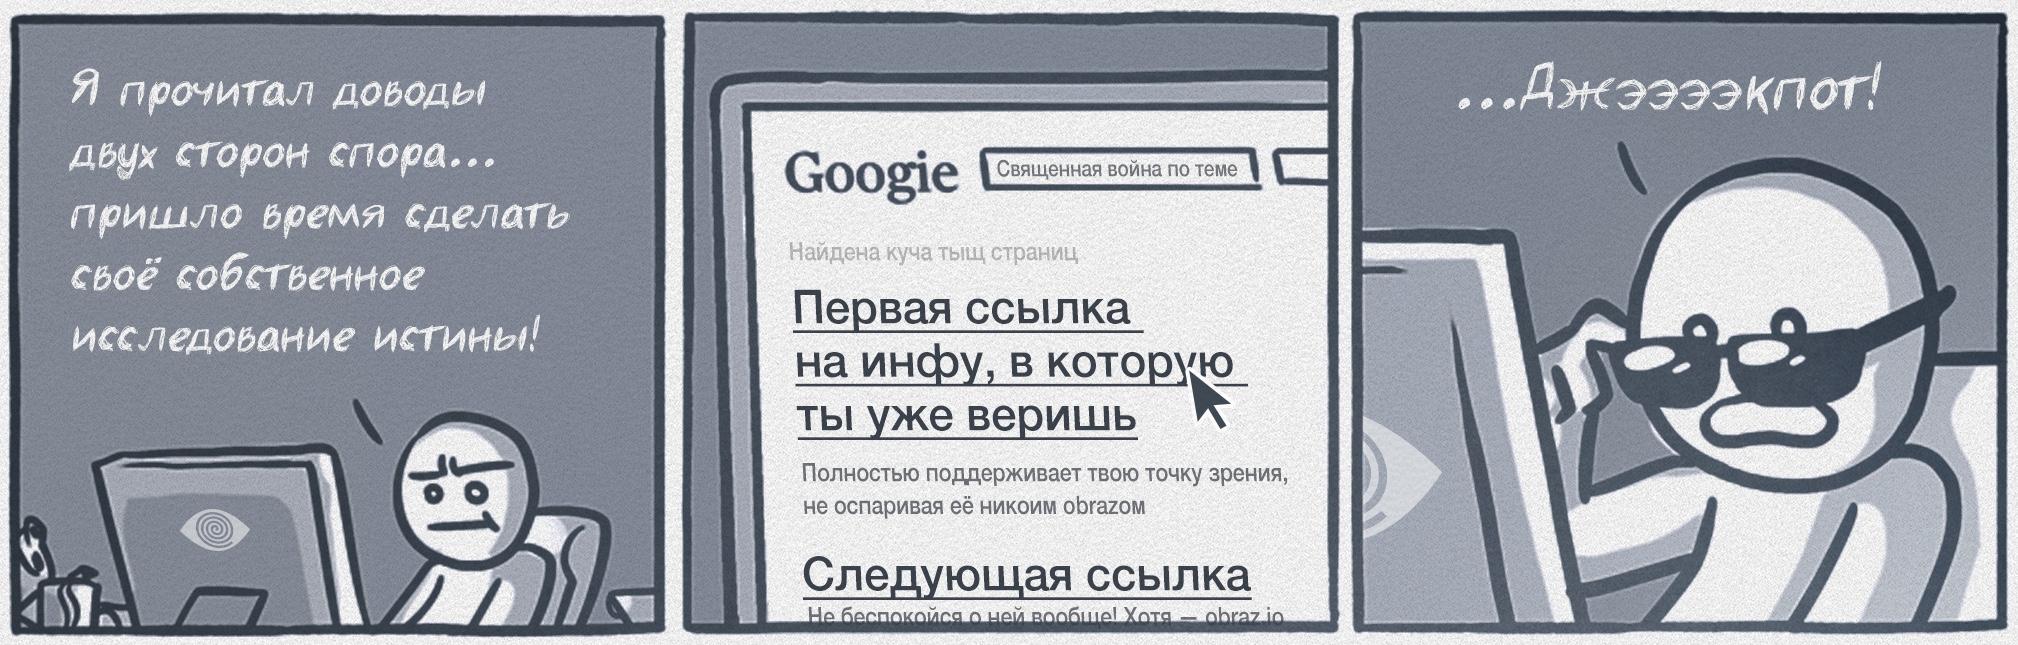 Email:learningkurakov@gmail com3292 13lh3e3.52wsysnhfr